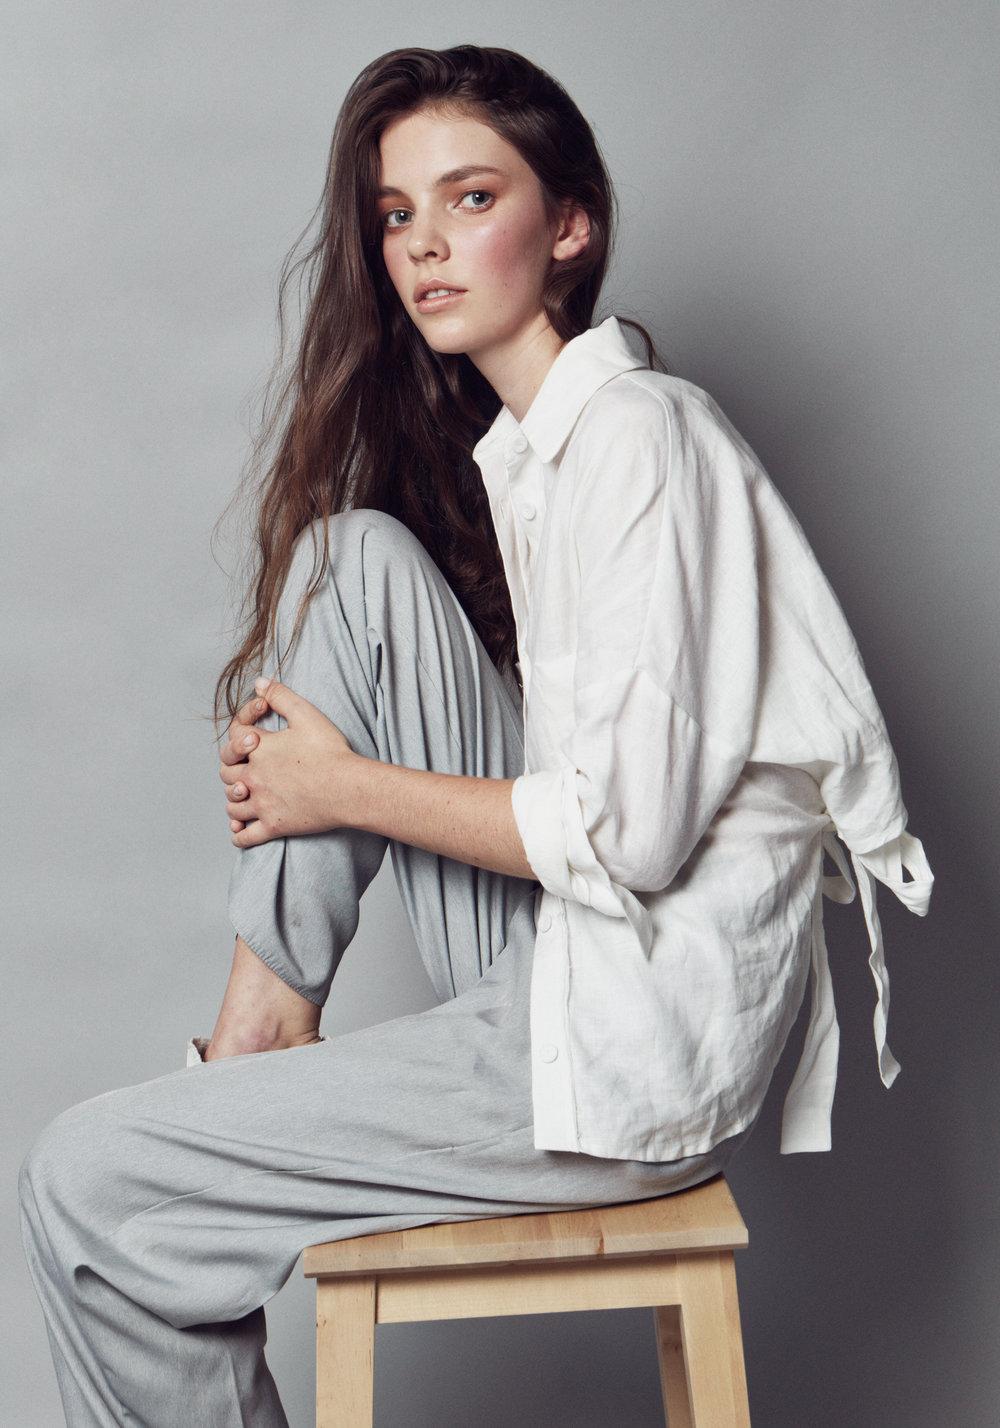 SOPHIA HANSEN-KNARHOI IMG